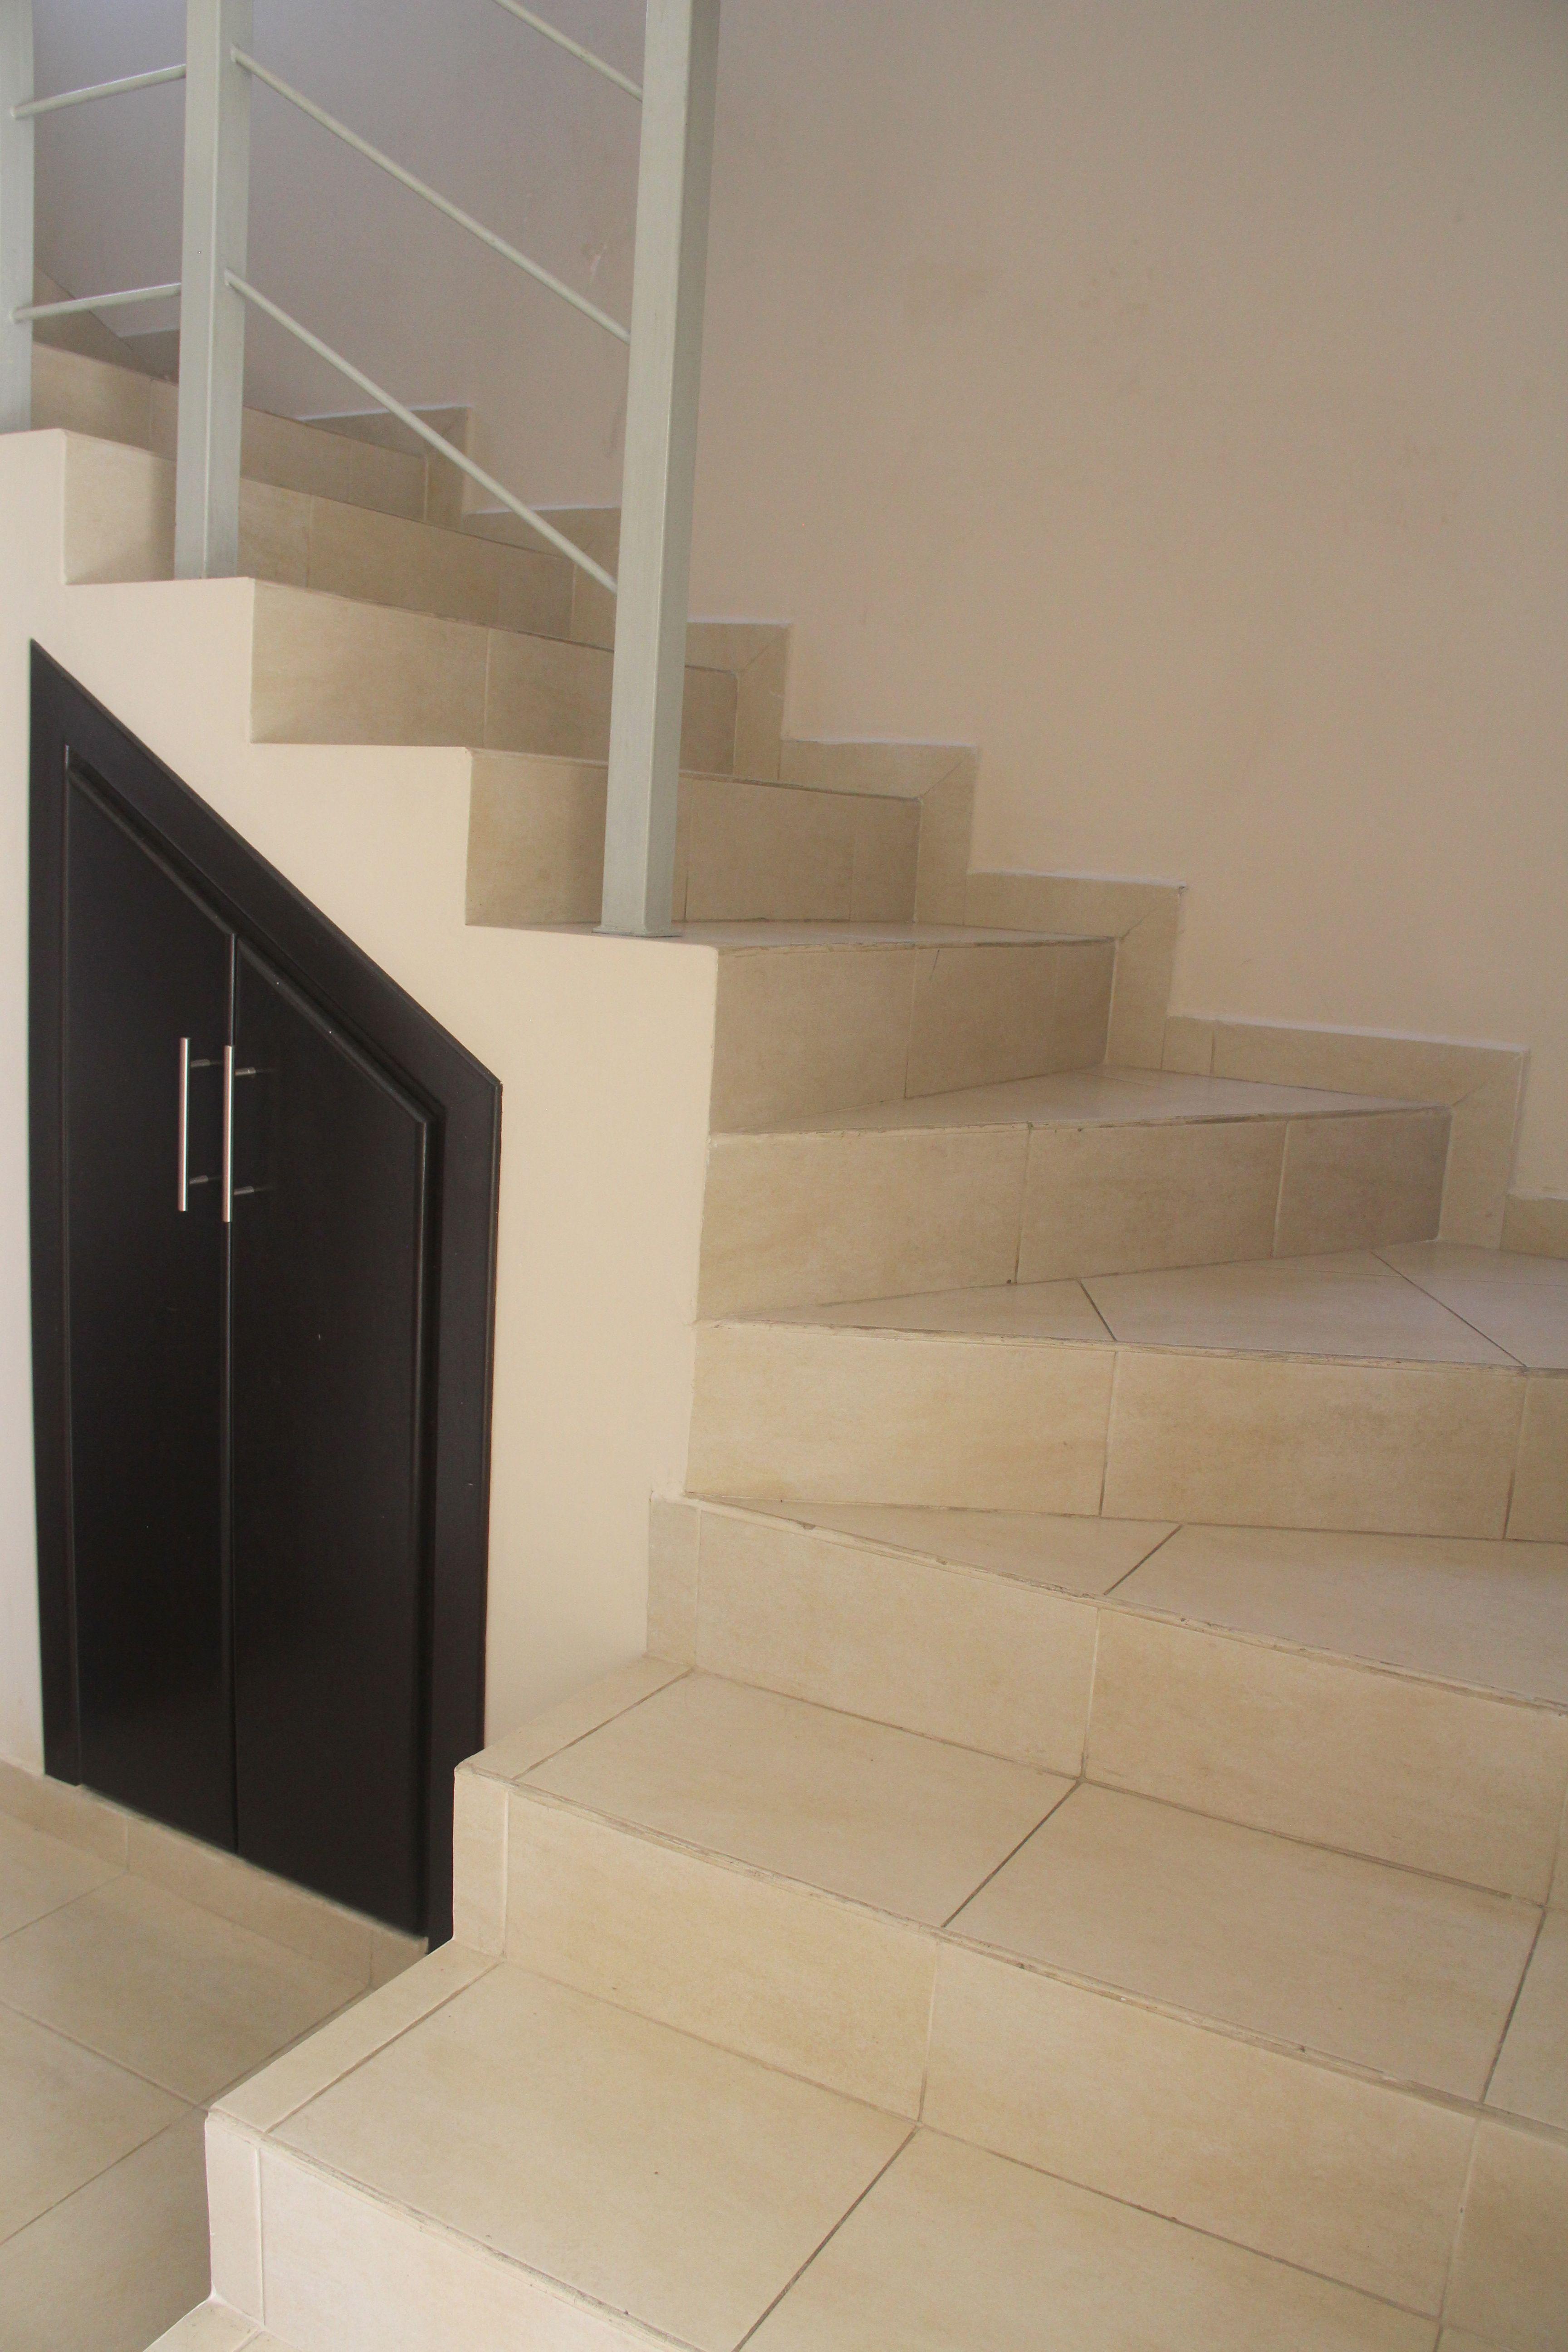 Escaleras al segundo nivel